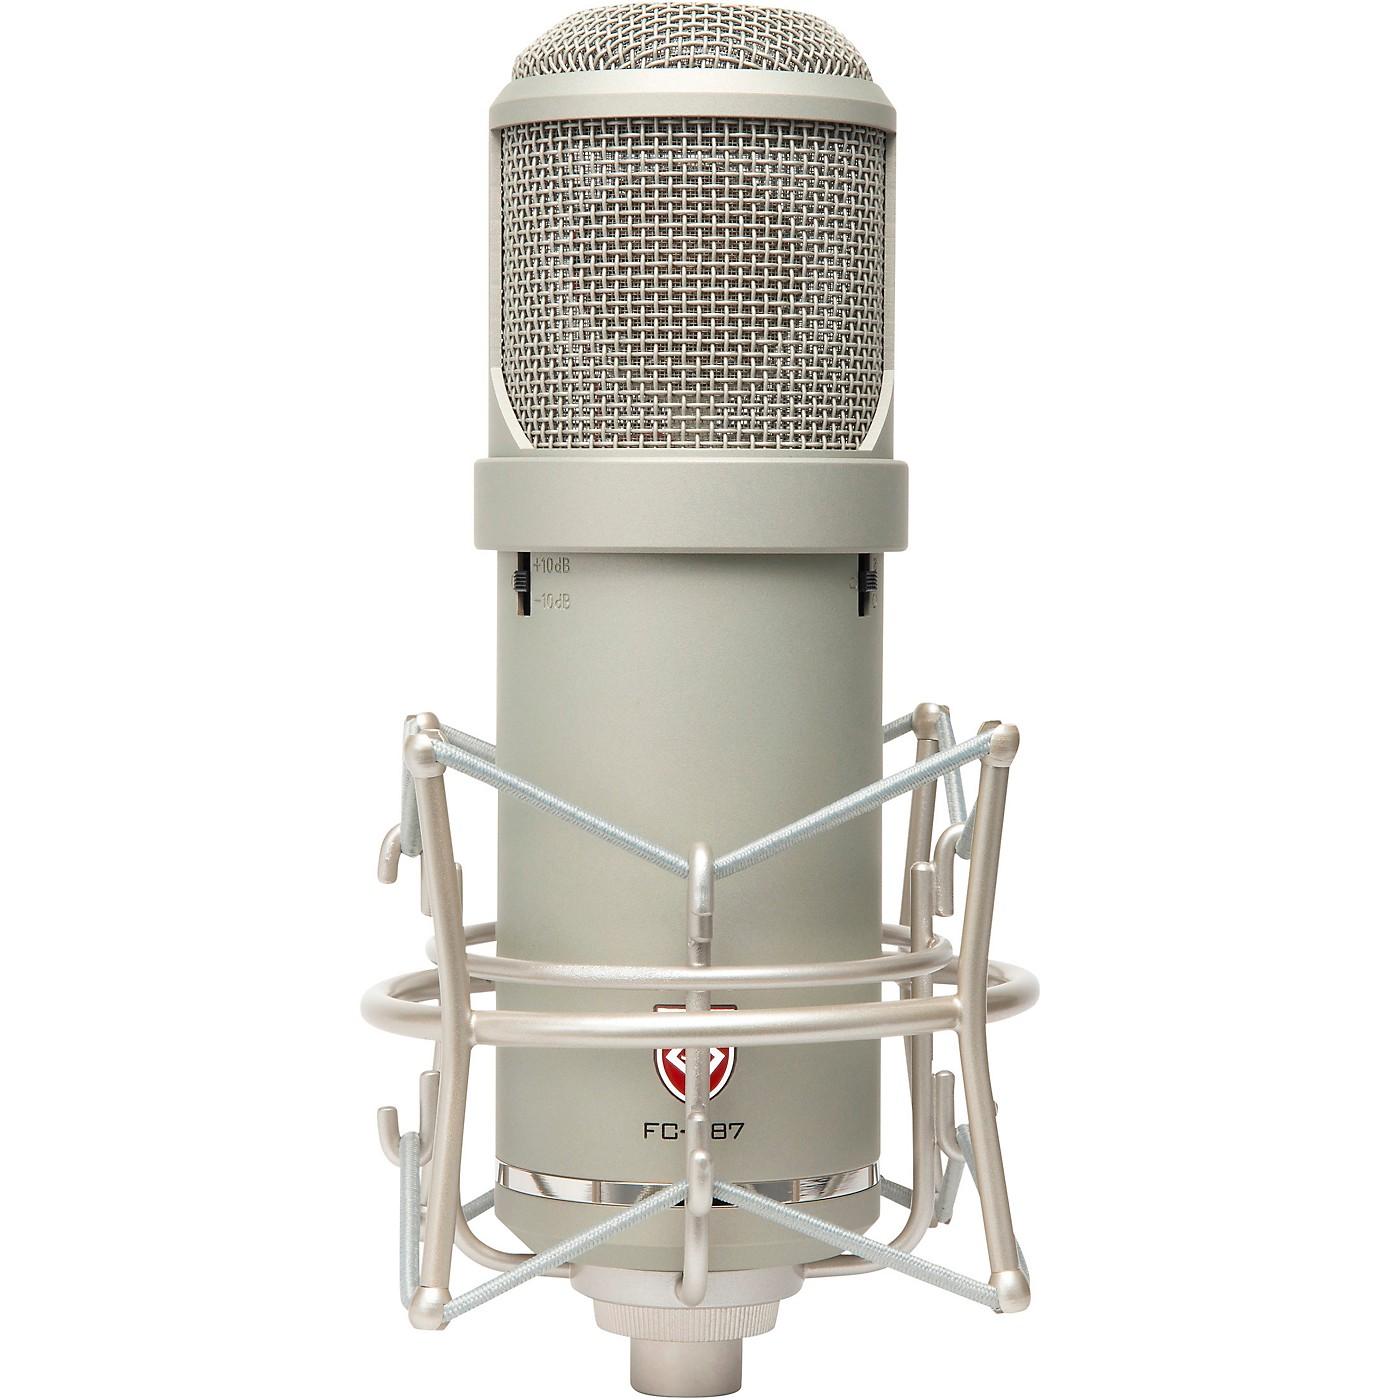 Lauten Audio Atlantis FC-387 FET Condenser Microphone thumbnail